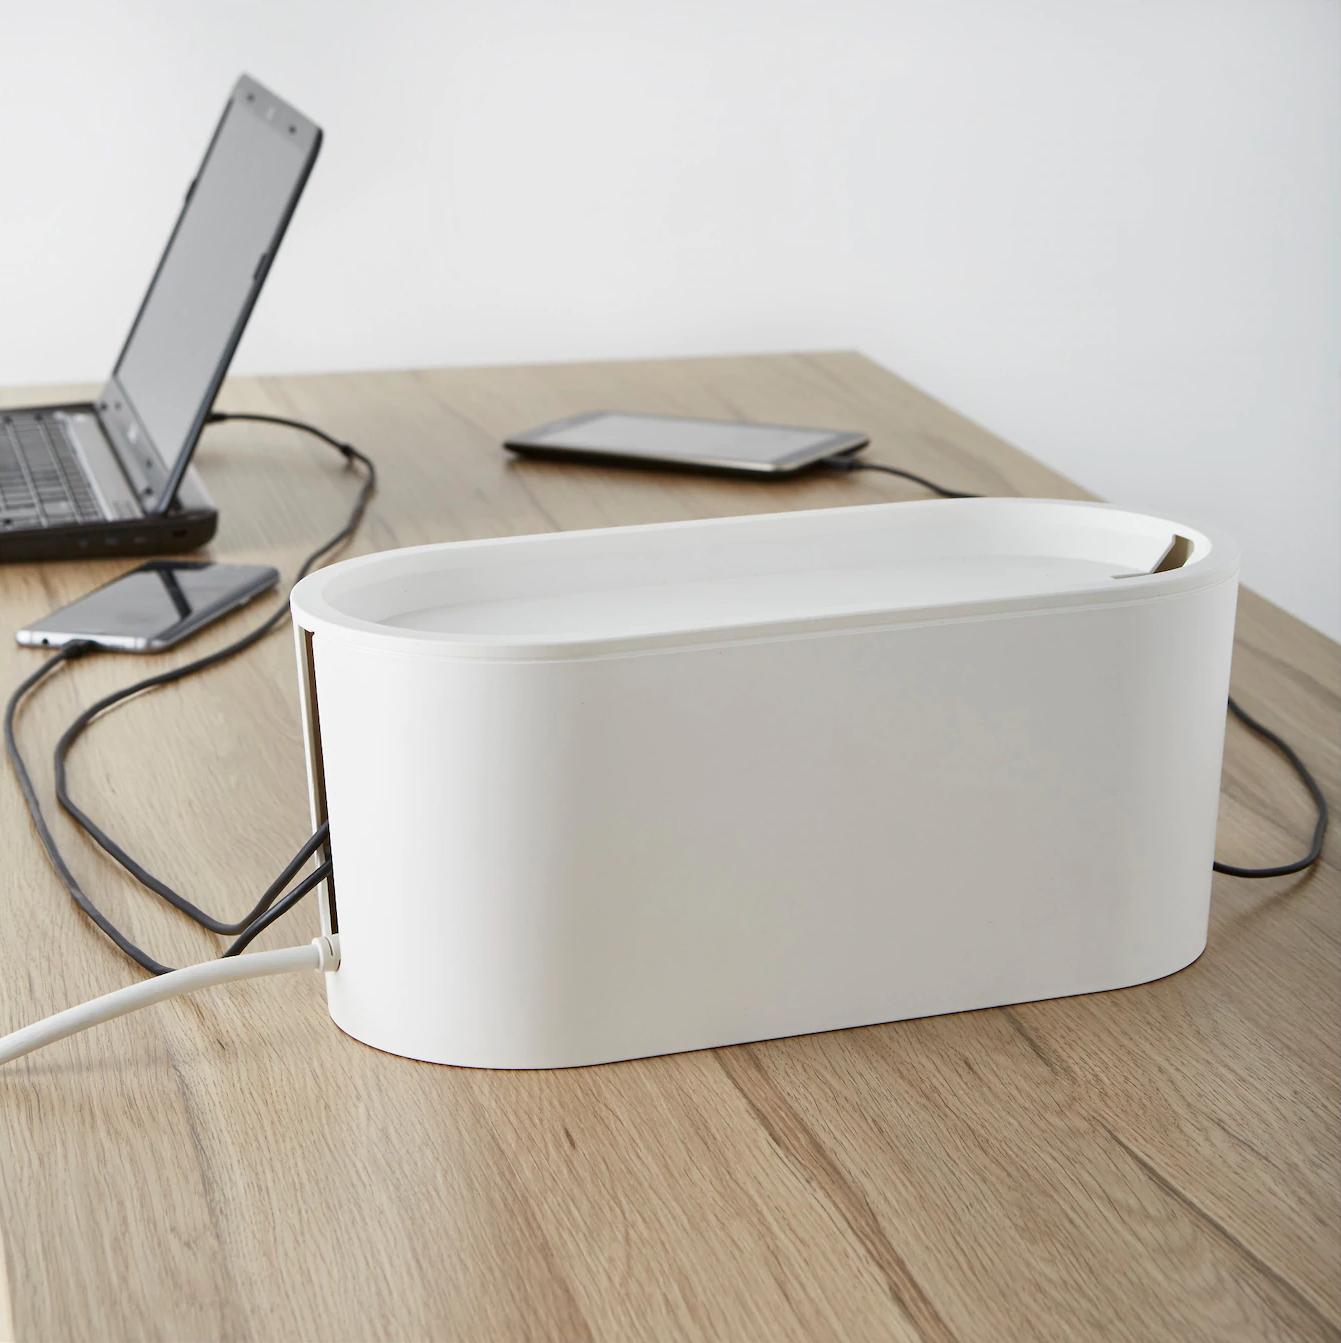 ROMMA, Organizador de cables + tapa en blanco